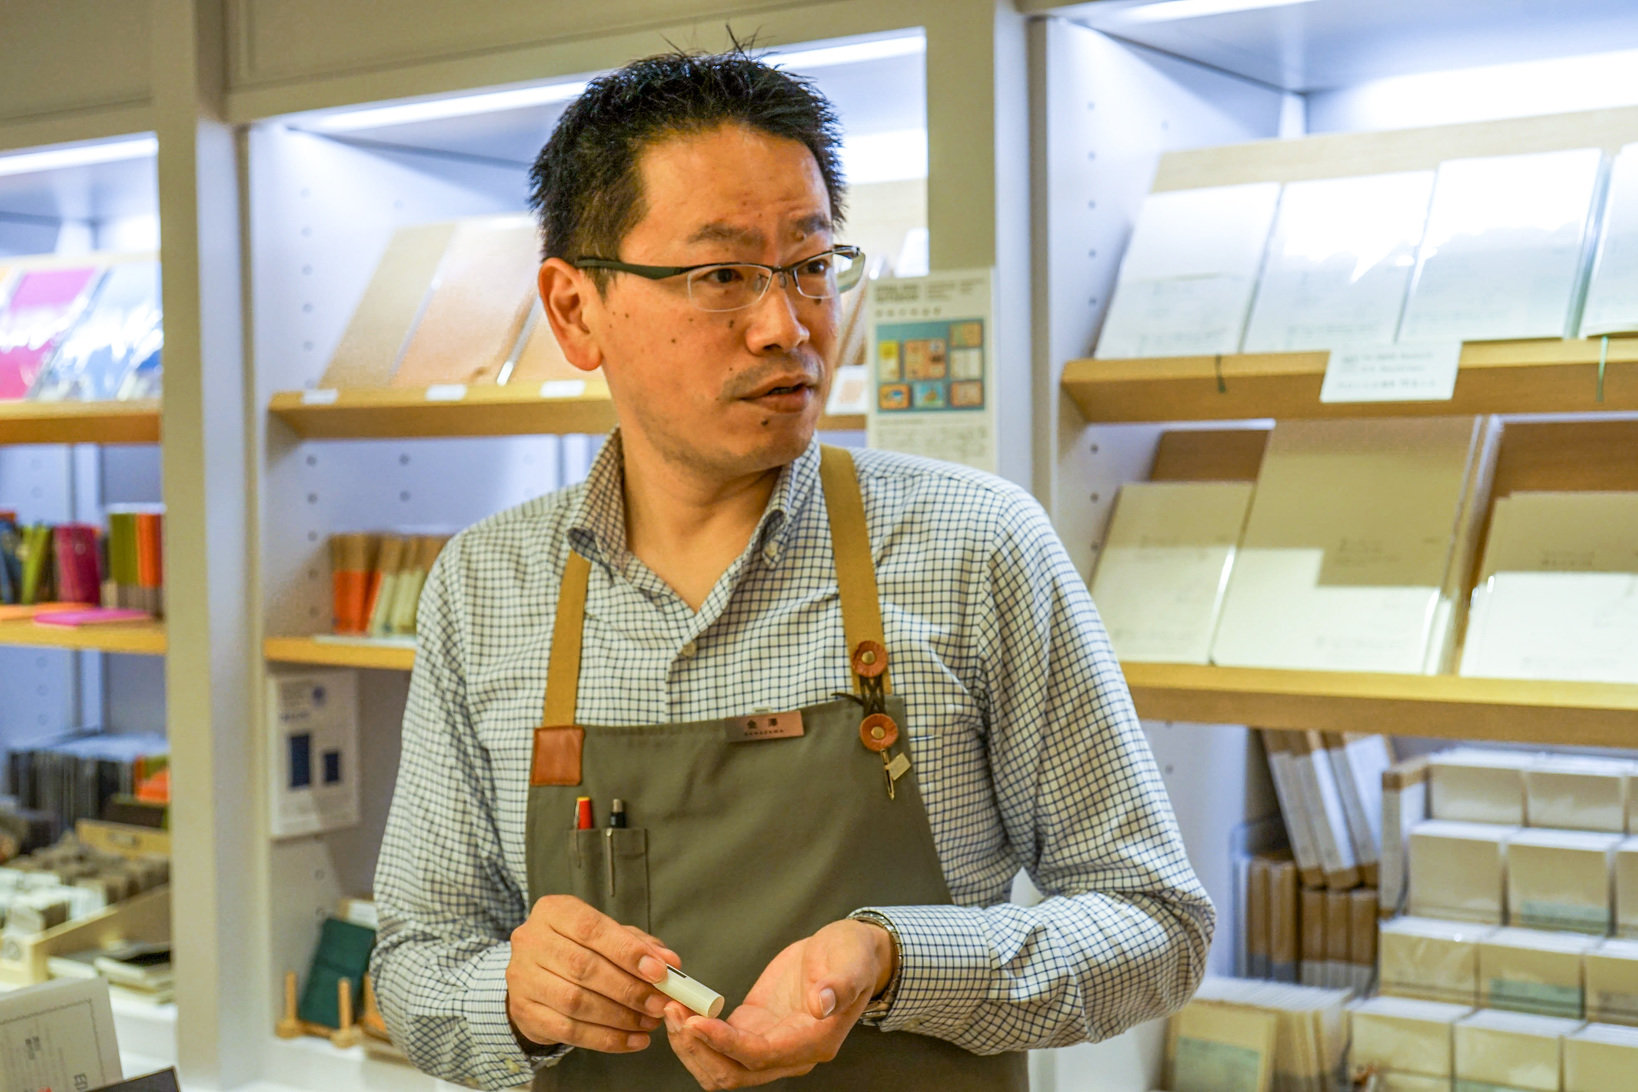 K.Itoyaで印章担当として勤務する金澤さん。